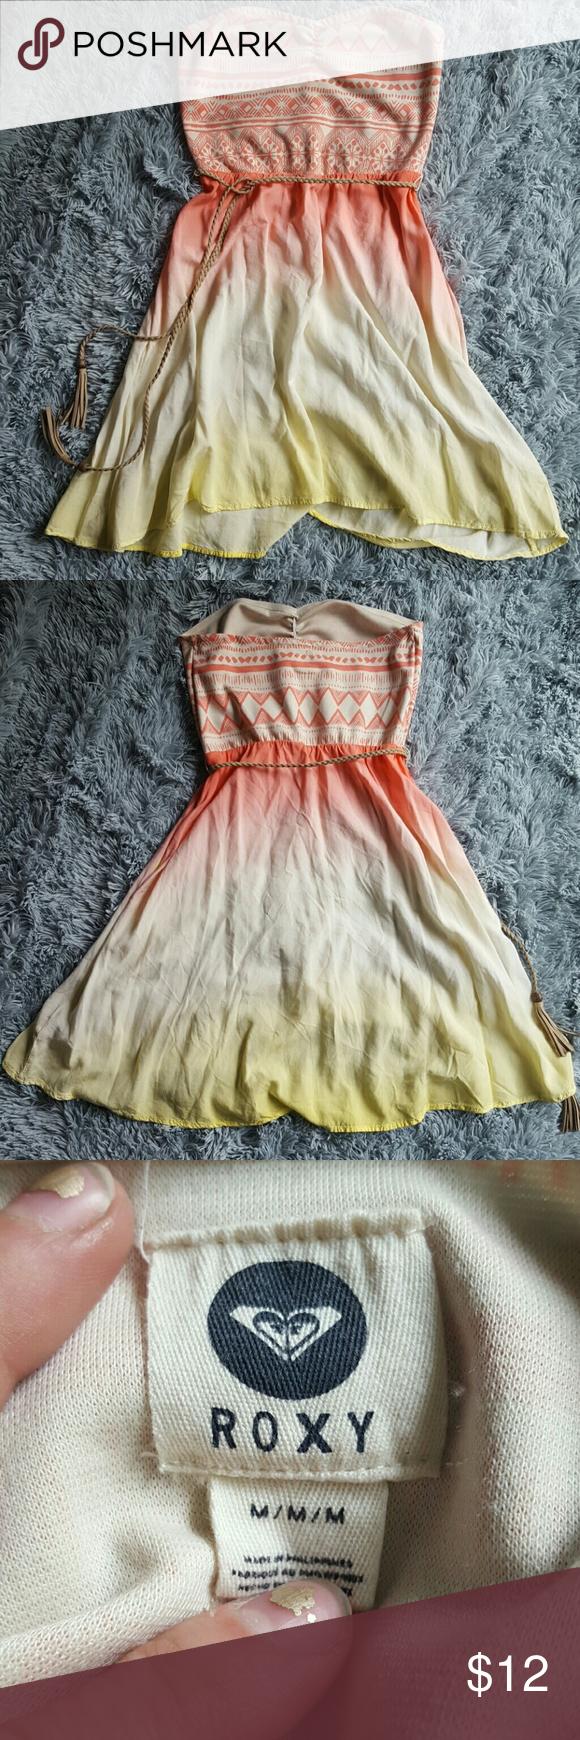 Roxy Pinterest Pinterest Roxy Strapless Dress Dress Strapless YRIT4nwq